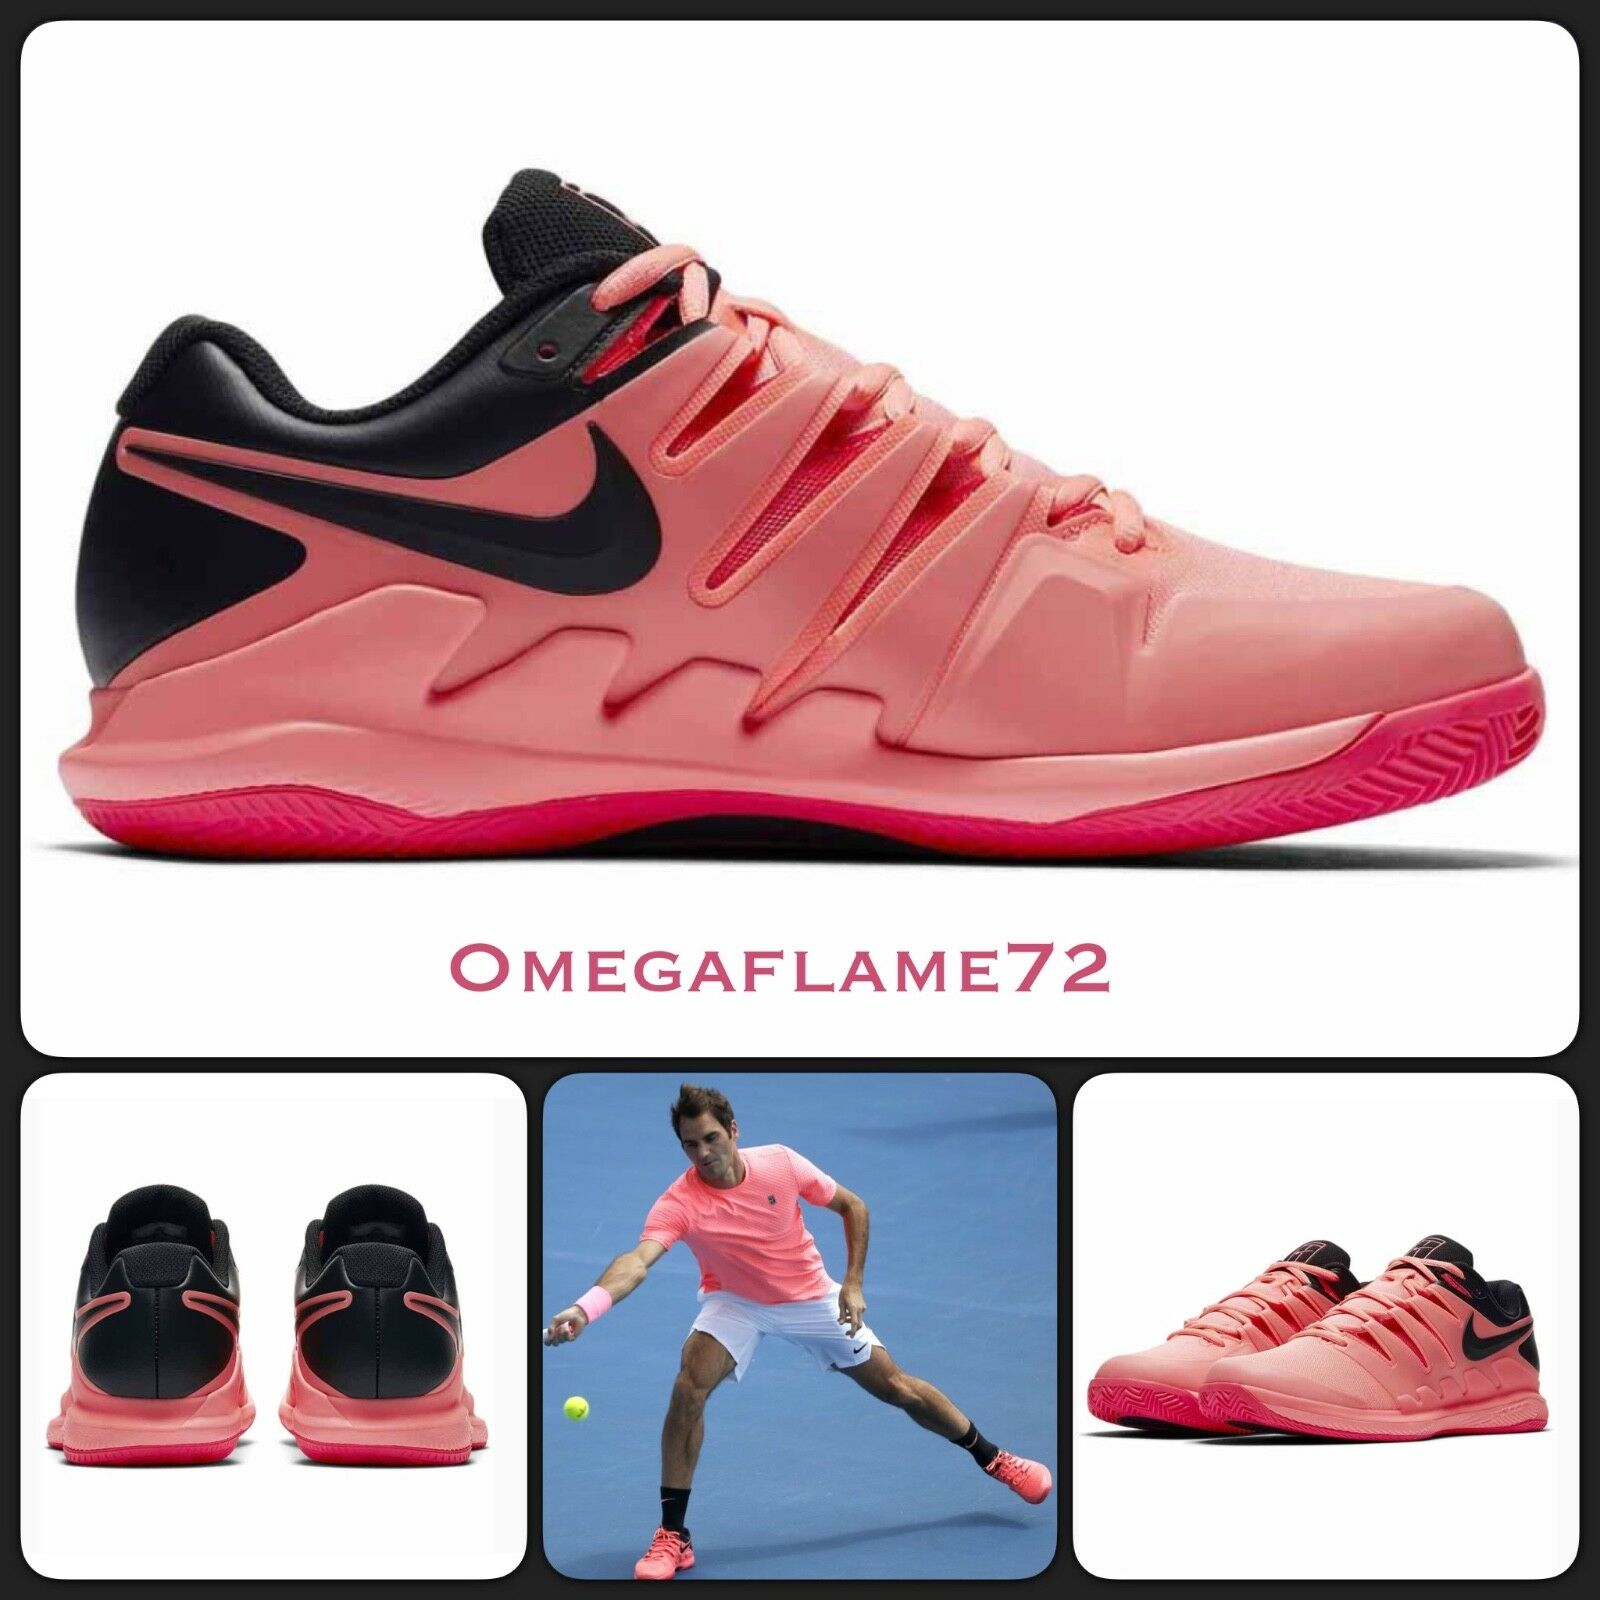 Nike Zoom Vapor, Federer Tennis Tennis Tennis X Scarpa Sz UE 43, US 9.5, AA8021-660 4dd952